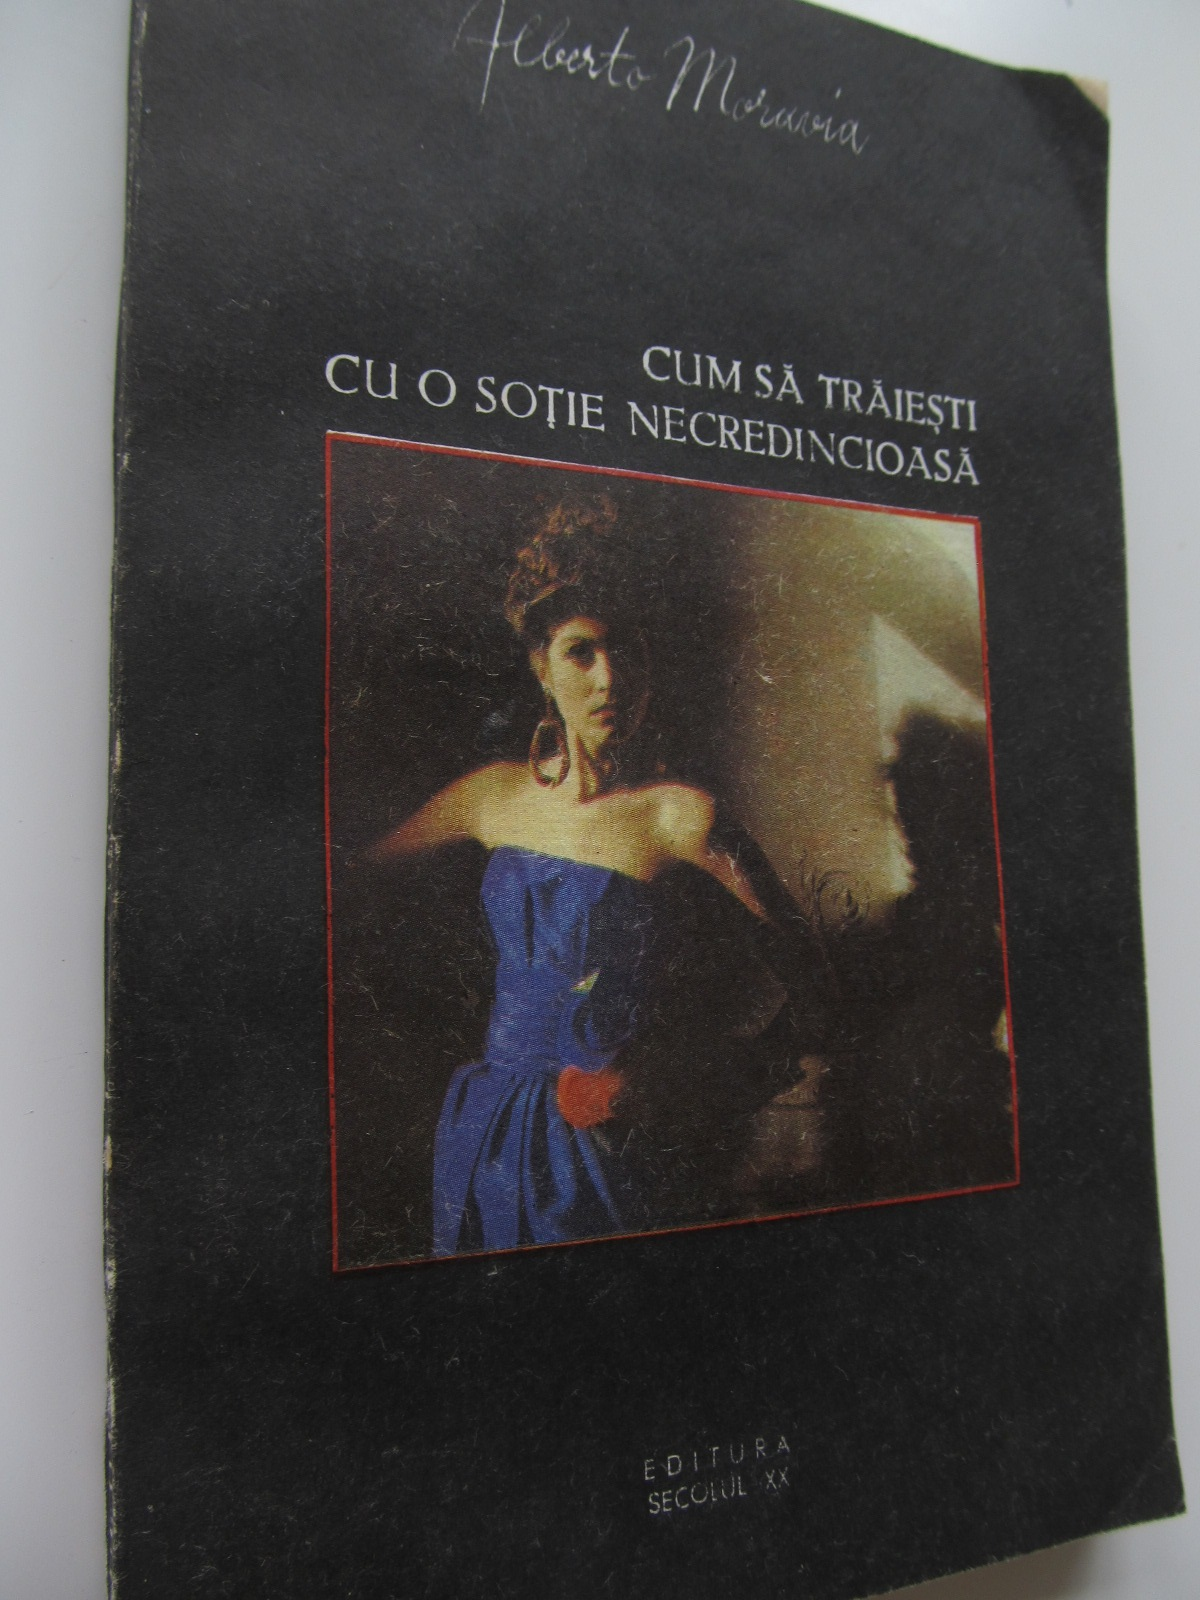 Cum sa traiesti cu o sotie necredincioasa - Alberto Moravia | Detalii carte